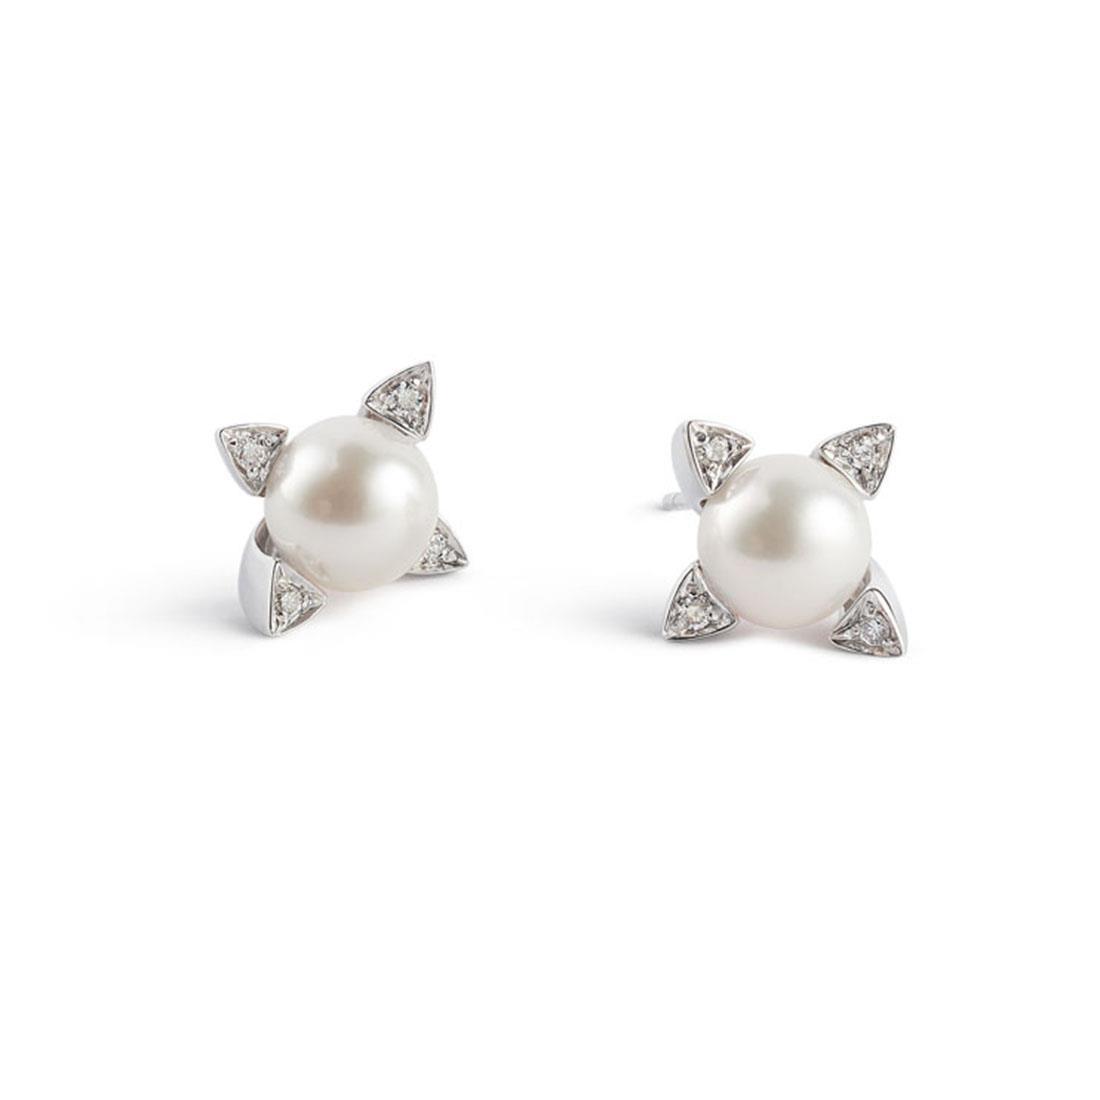 Orecchini con perle Akoya - ALFIERI & ST. JOHN